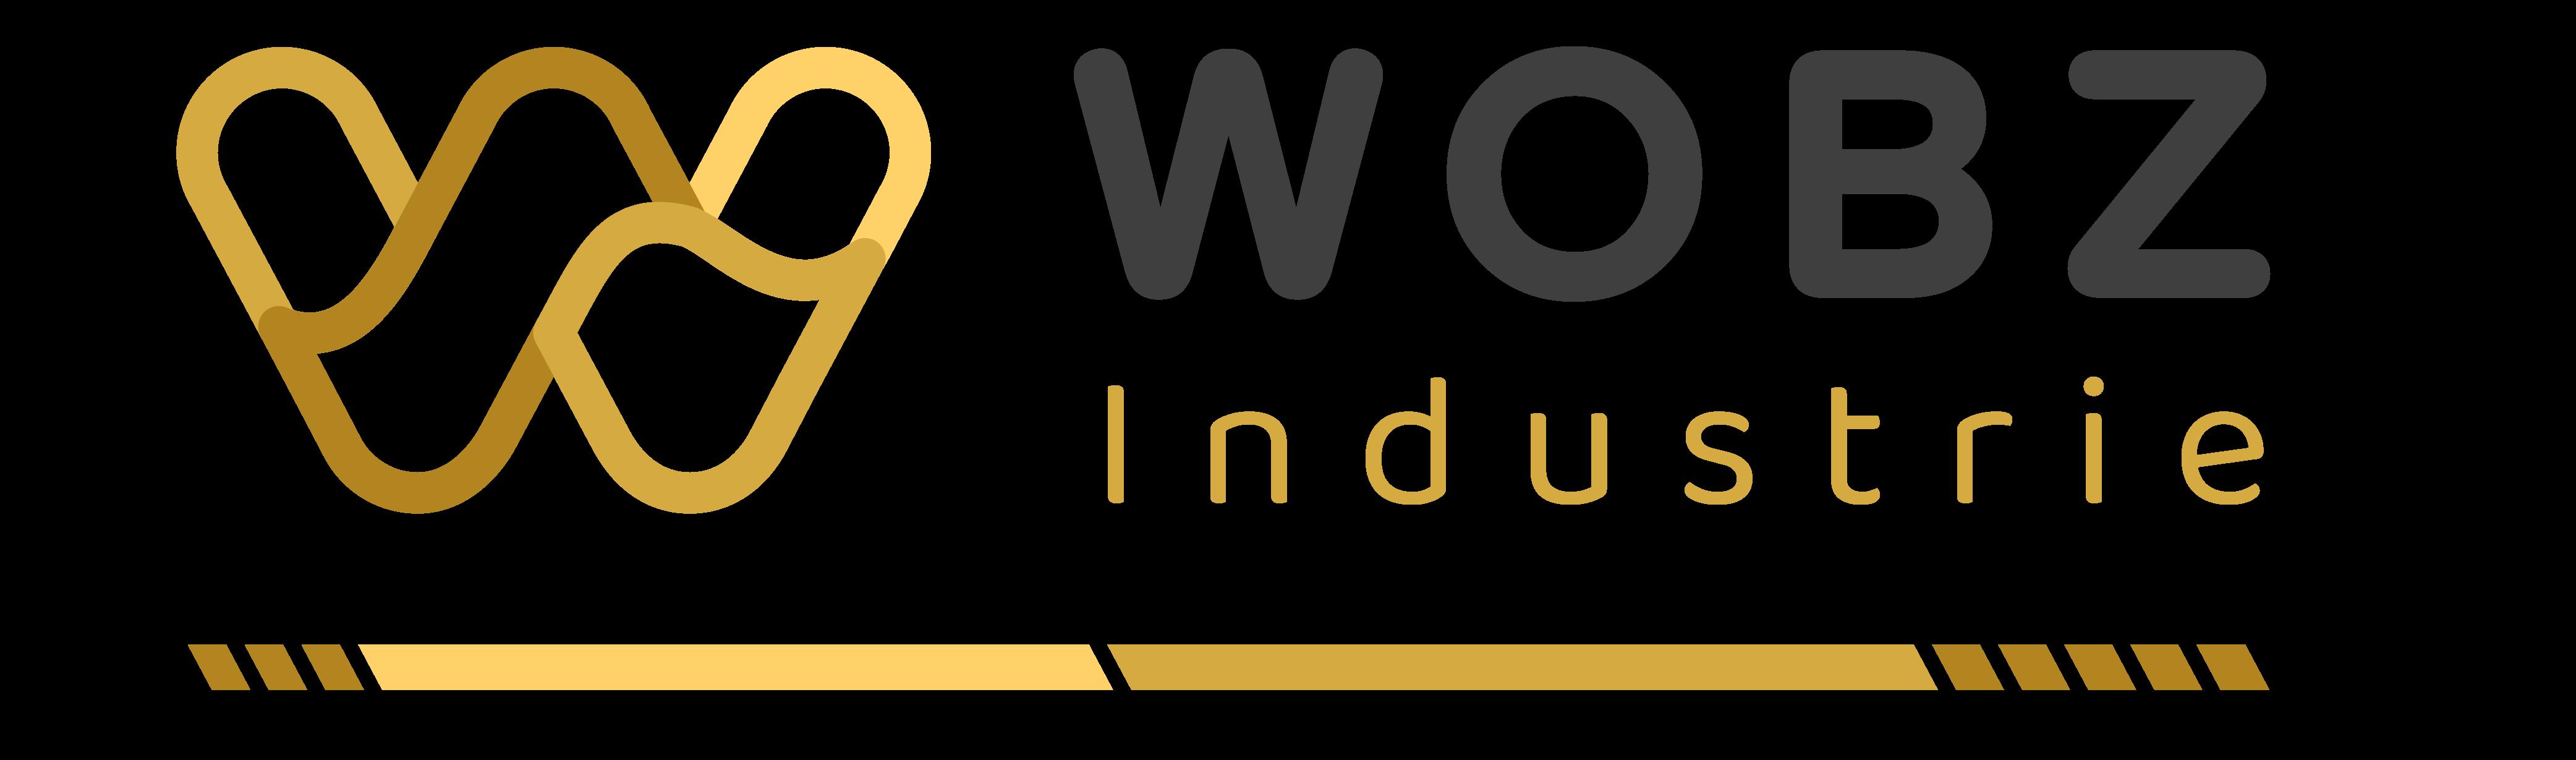 logo wobz categories_Wobz Indust Couleur Horiz